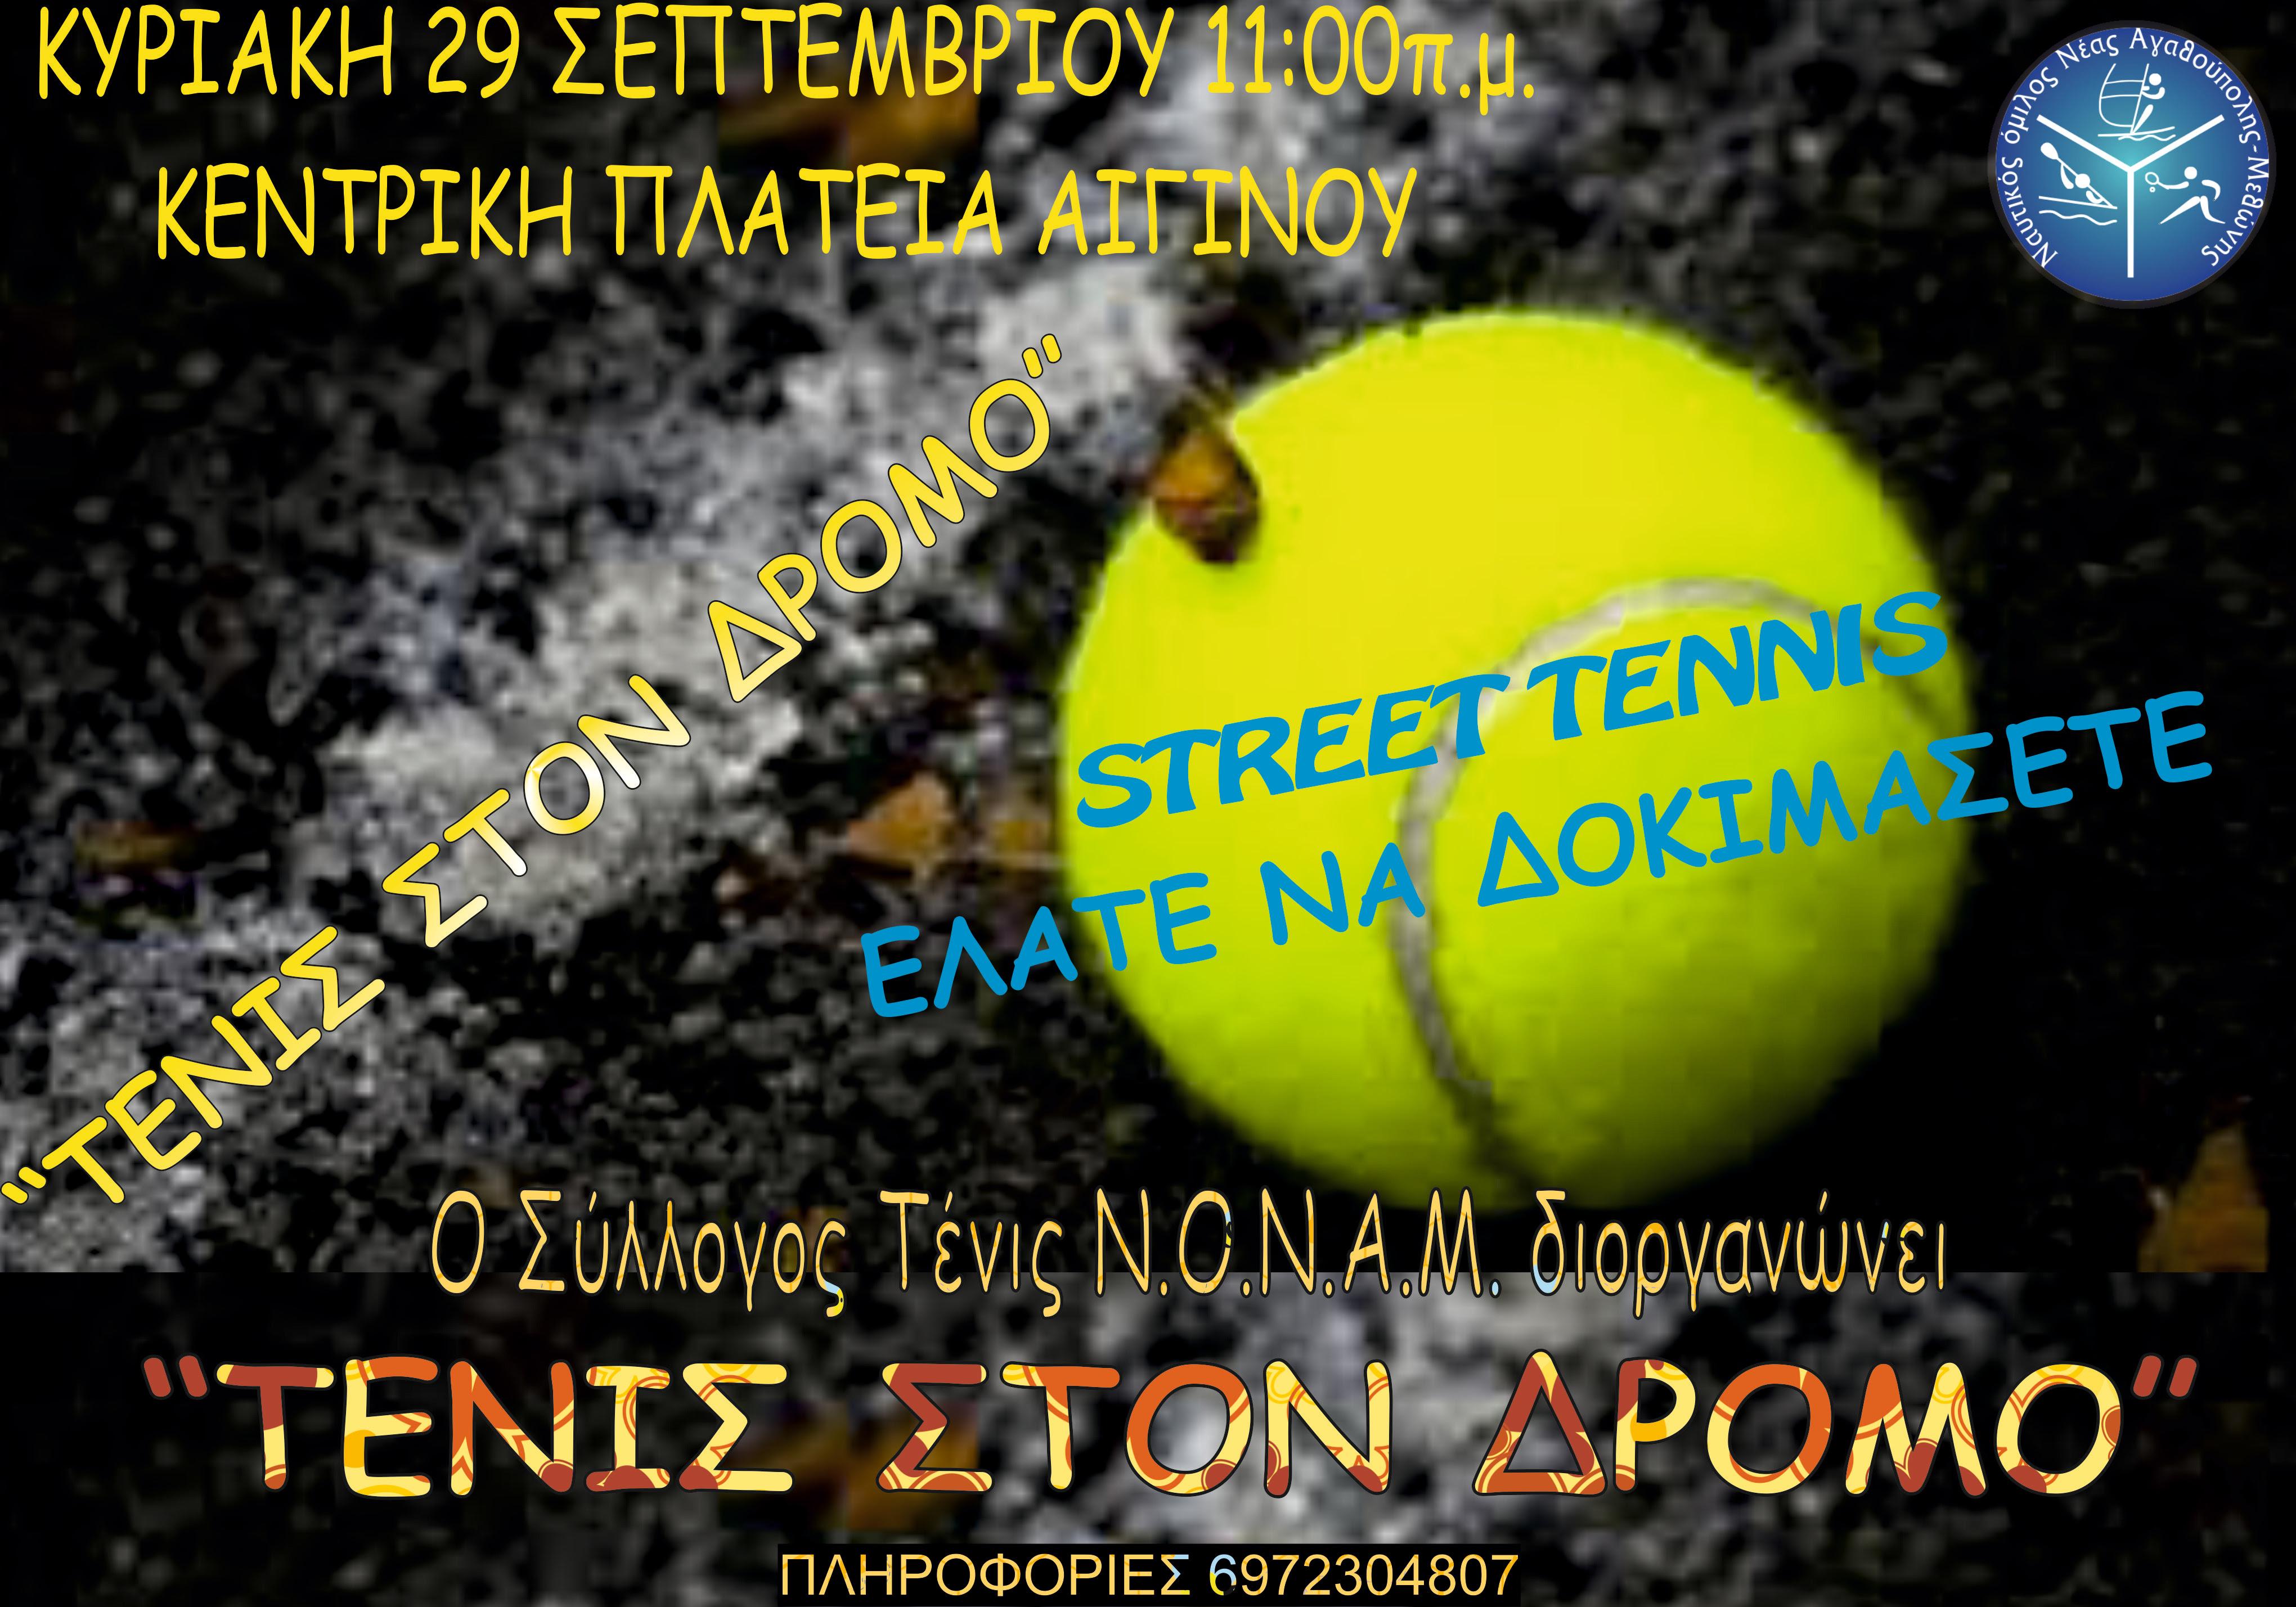 http://noamm.files.wordpress.com/2013/09/street-tennis_ceb1ceb9ceb3ceb9cebdceb9cebf.jpg